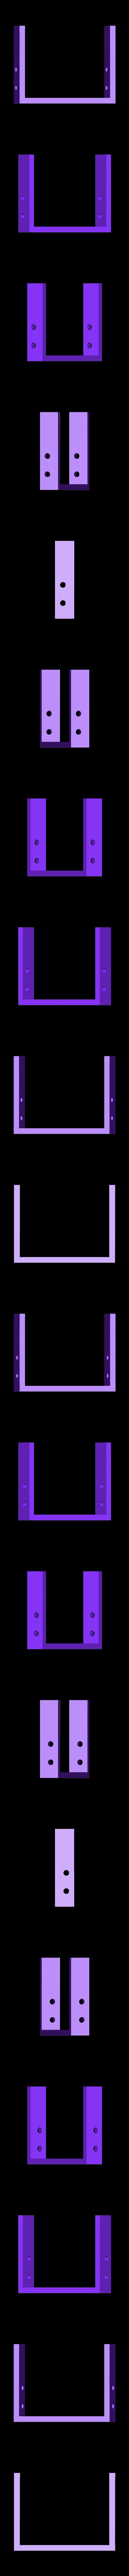 Mini-skybot-U-rear.stl Télécharger fichier STL gratuit Châssis de robot MiniSkybot • Plan imprimable en 3D, Ogrod3d